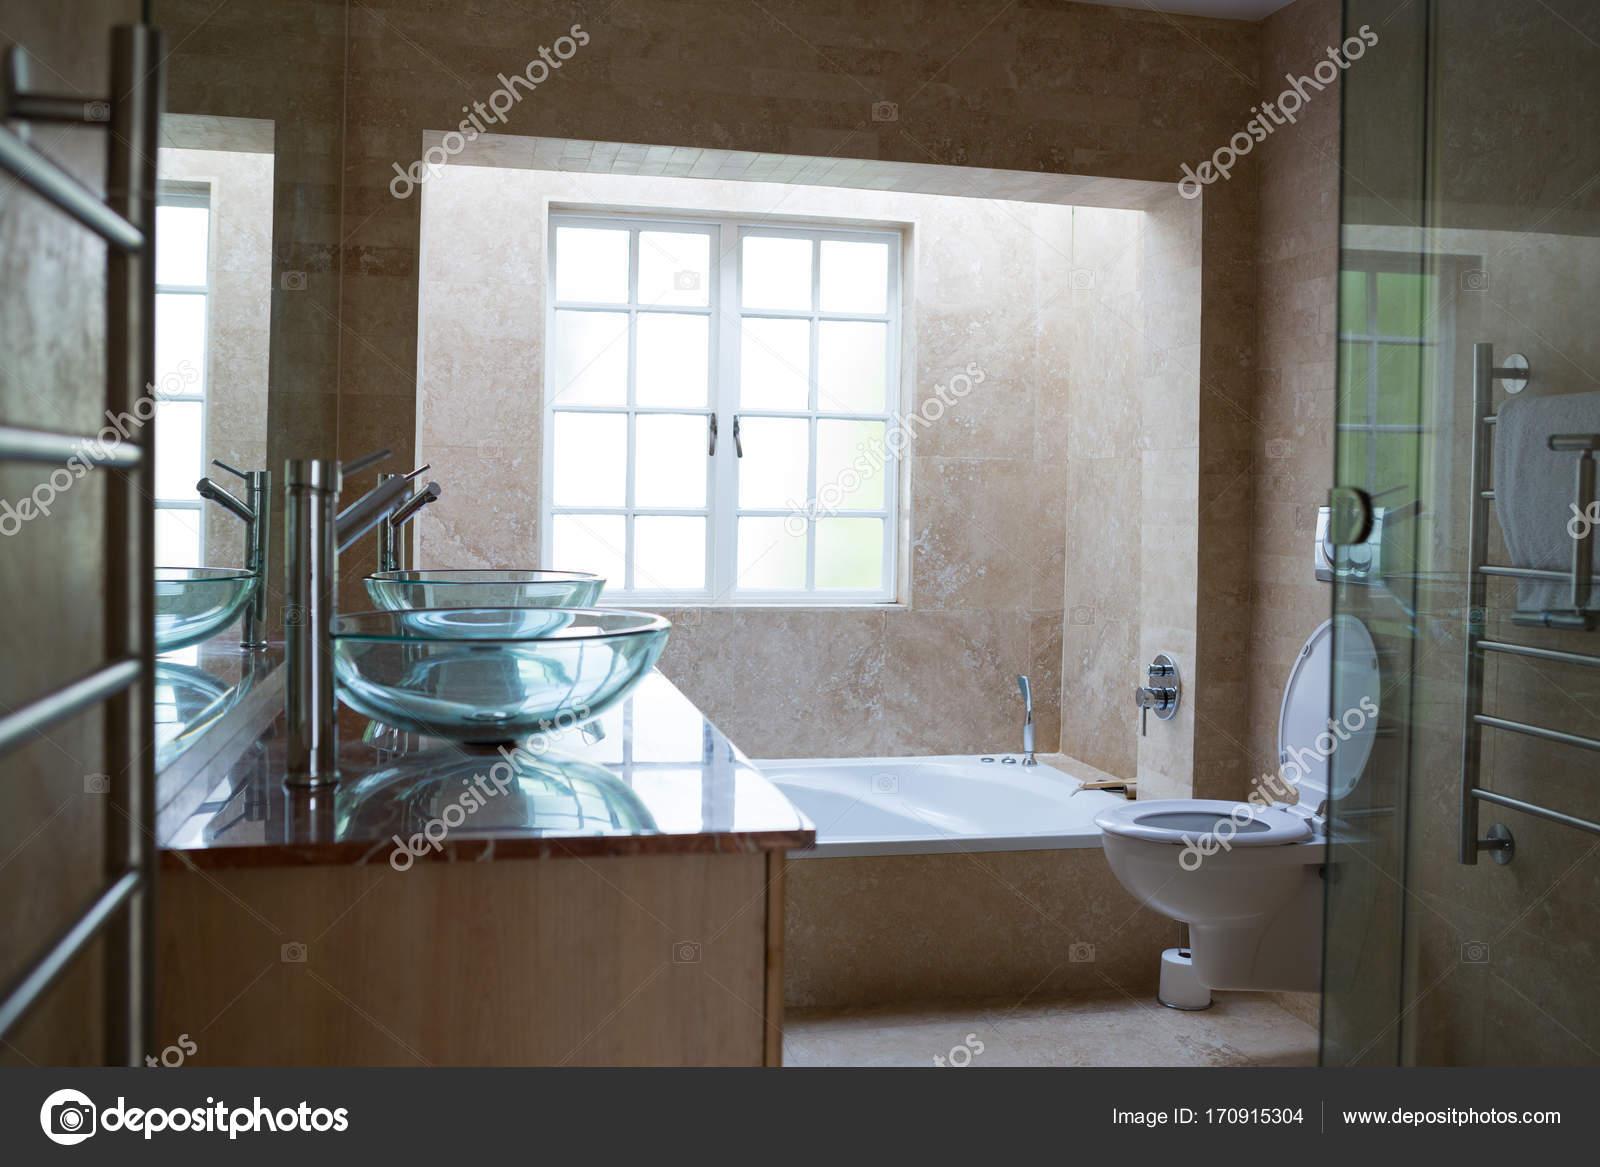 GroBartig Großes Bad In Luxus Haus U2014 Stockfoto